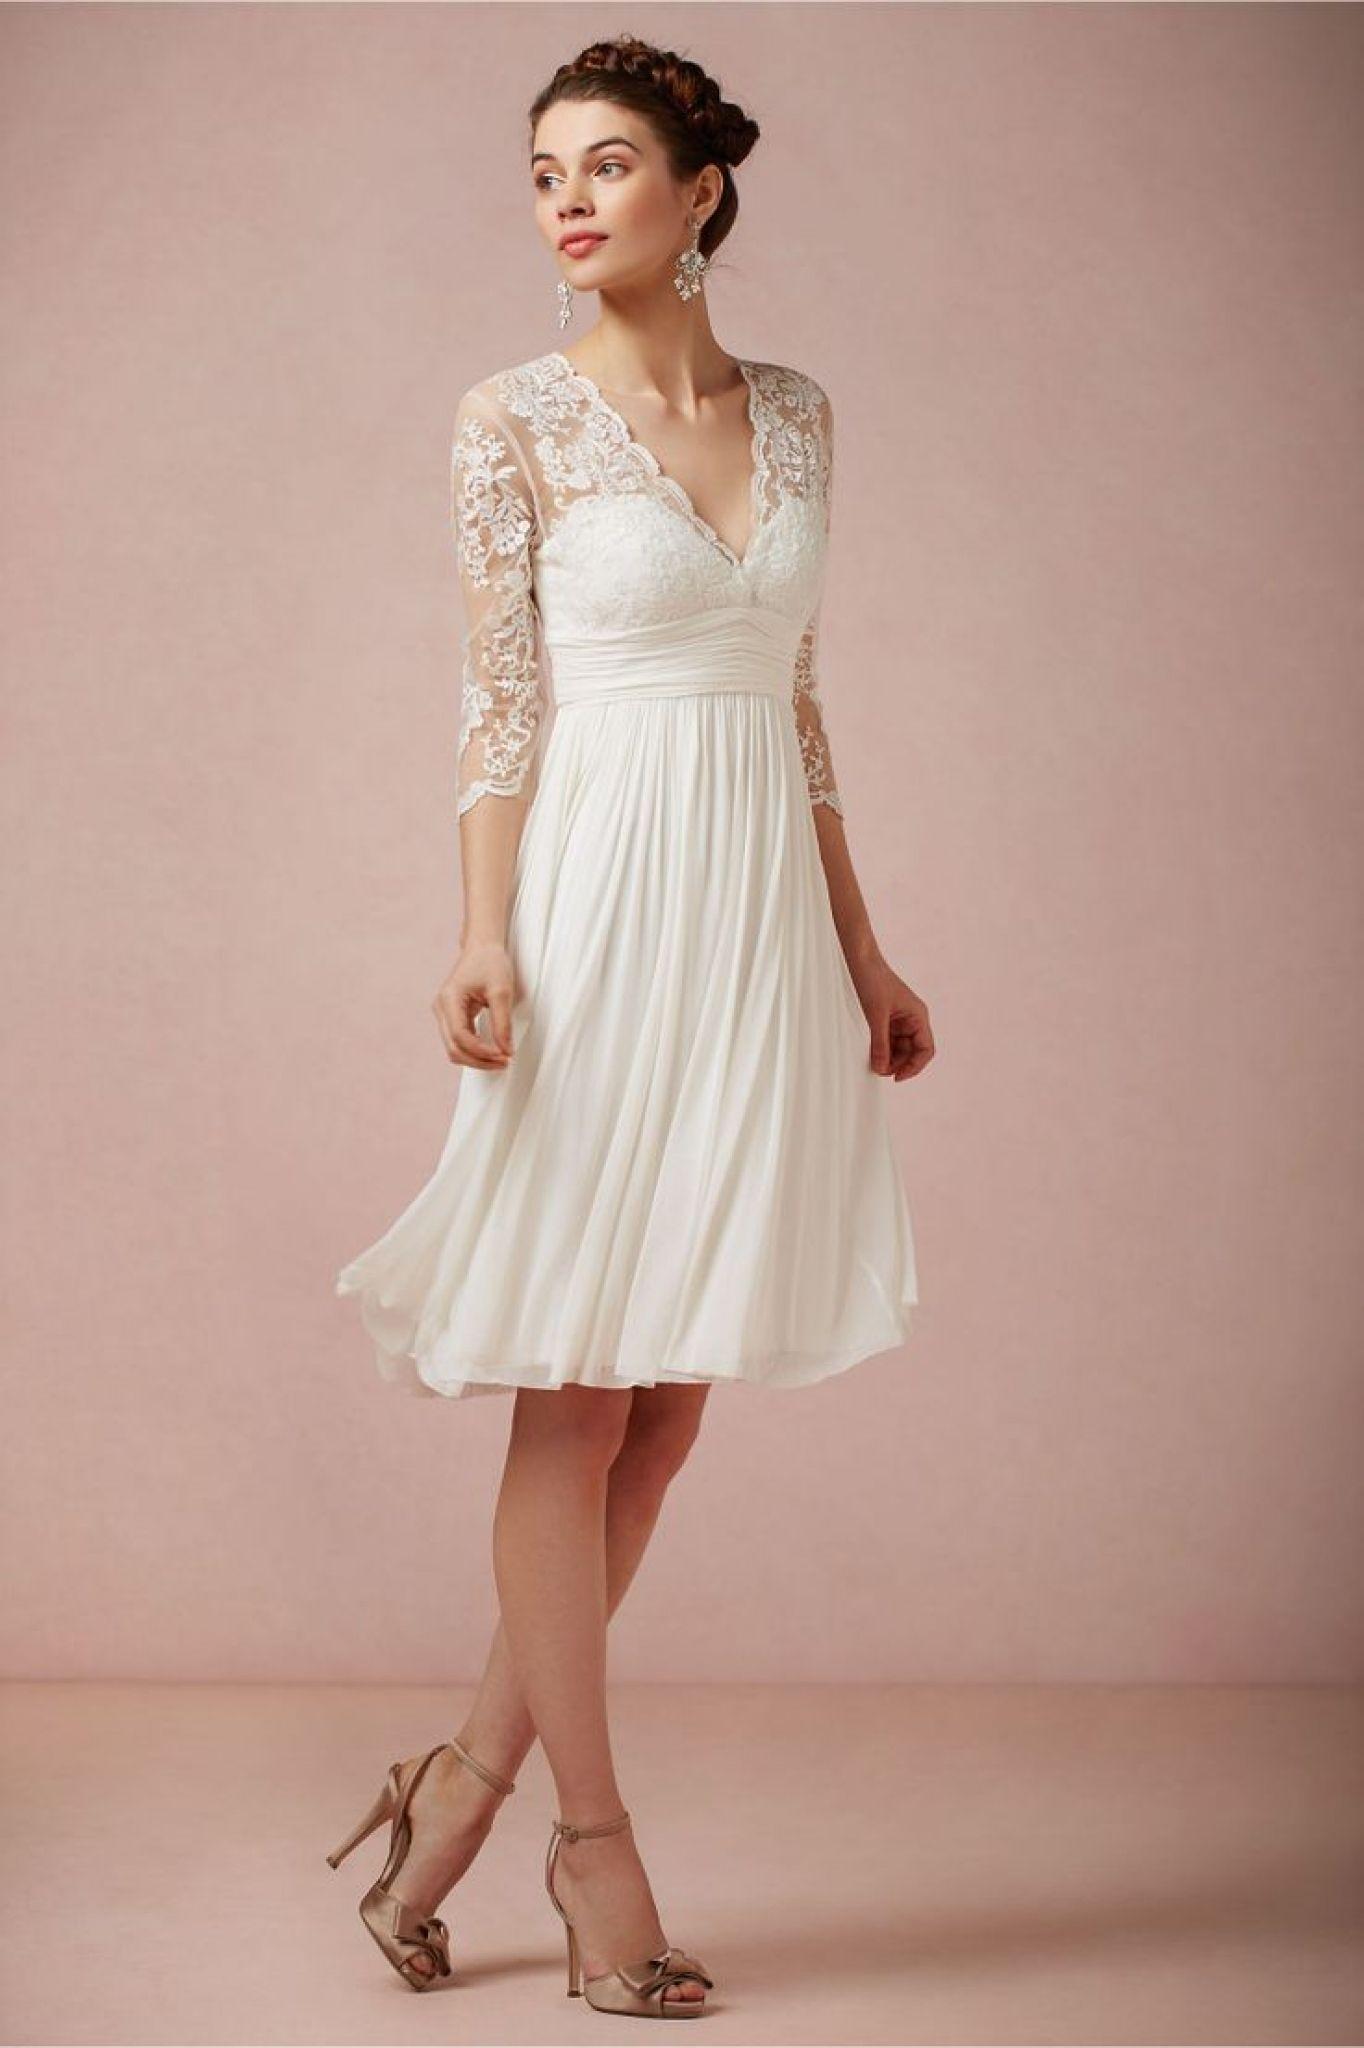 Short wedding dresses plus size  simple wedding dress beach ceremony  best shapewear for wedding